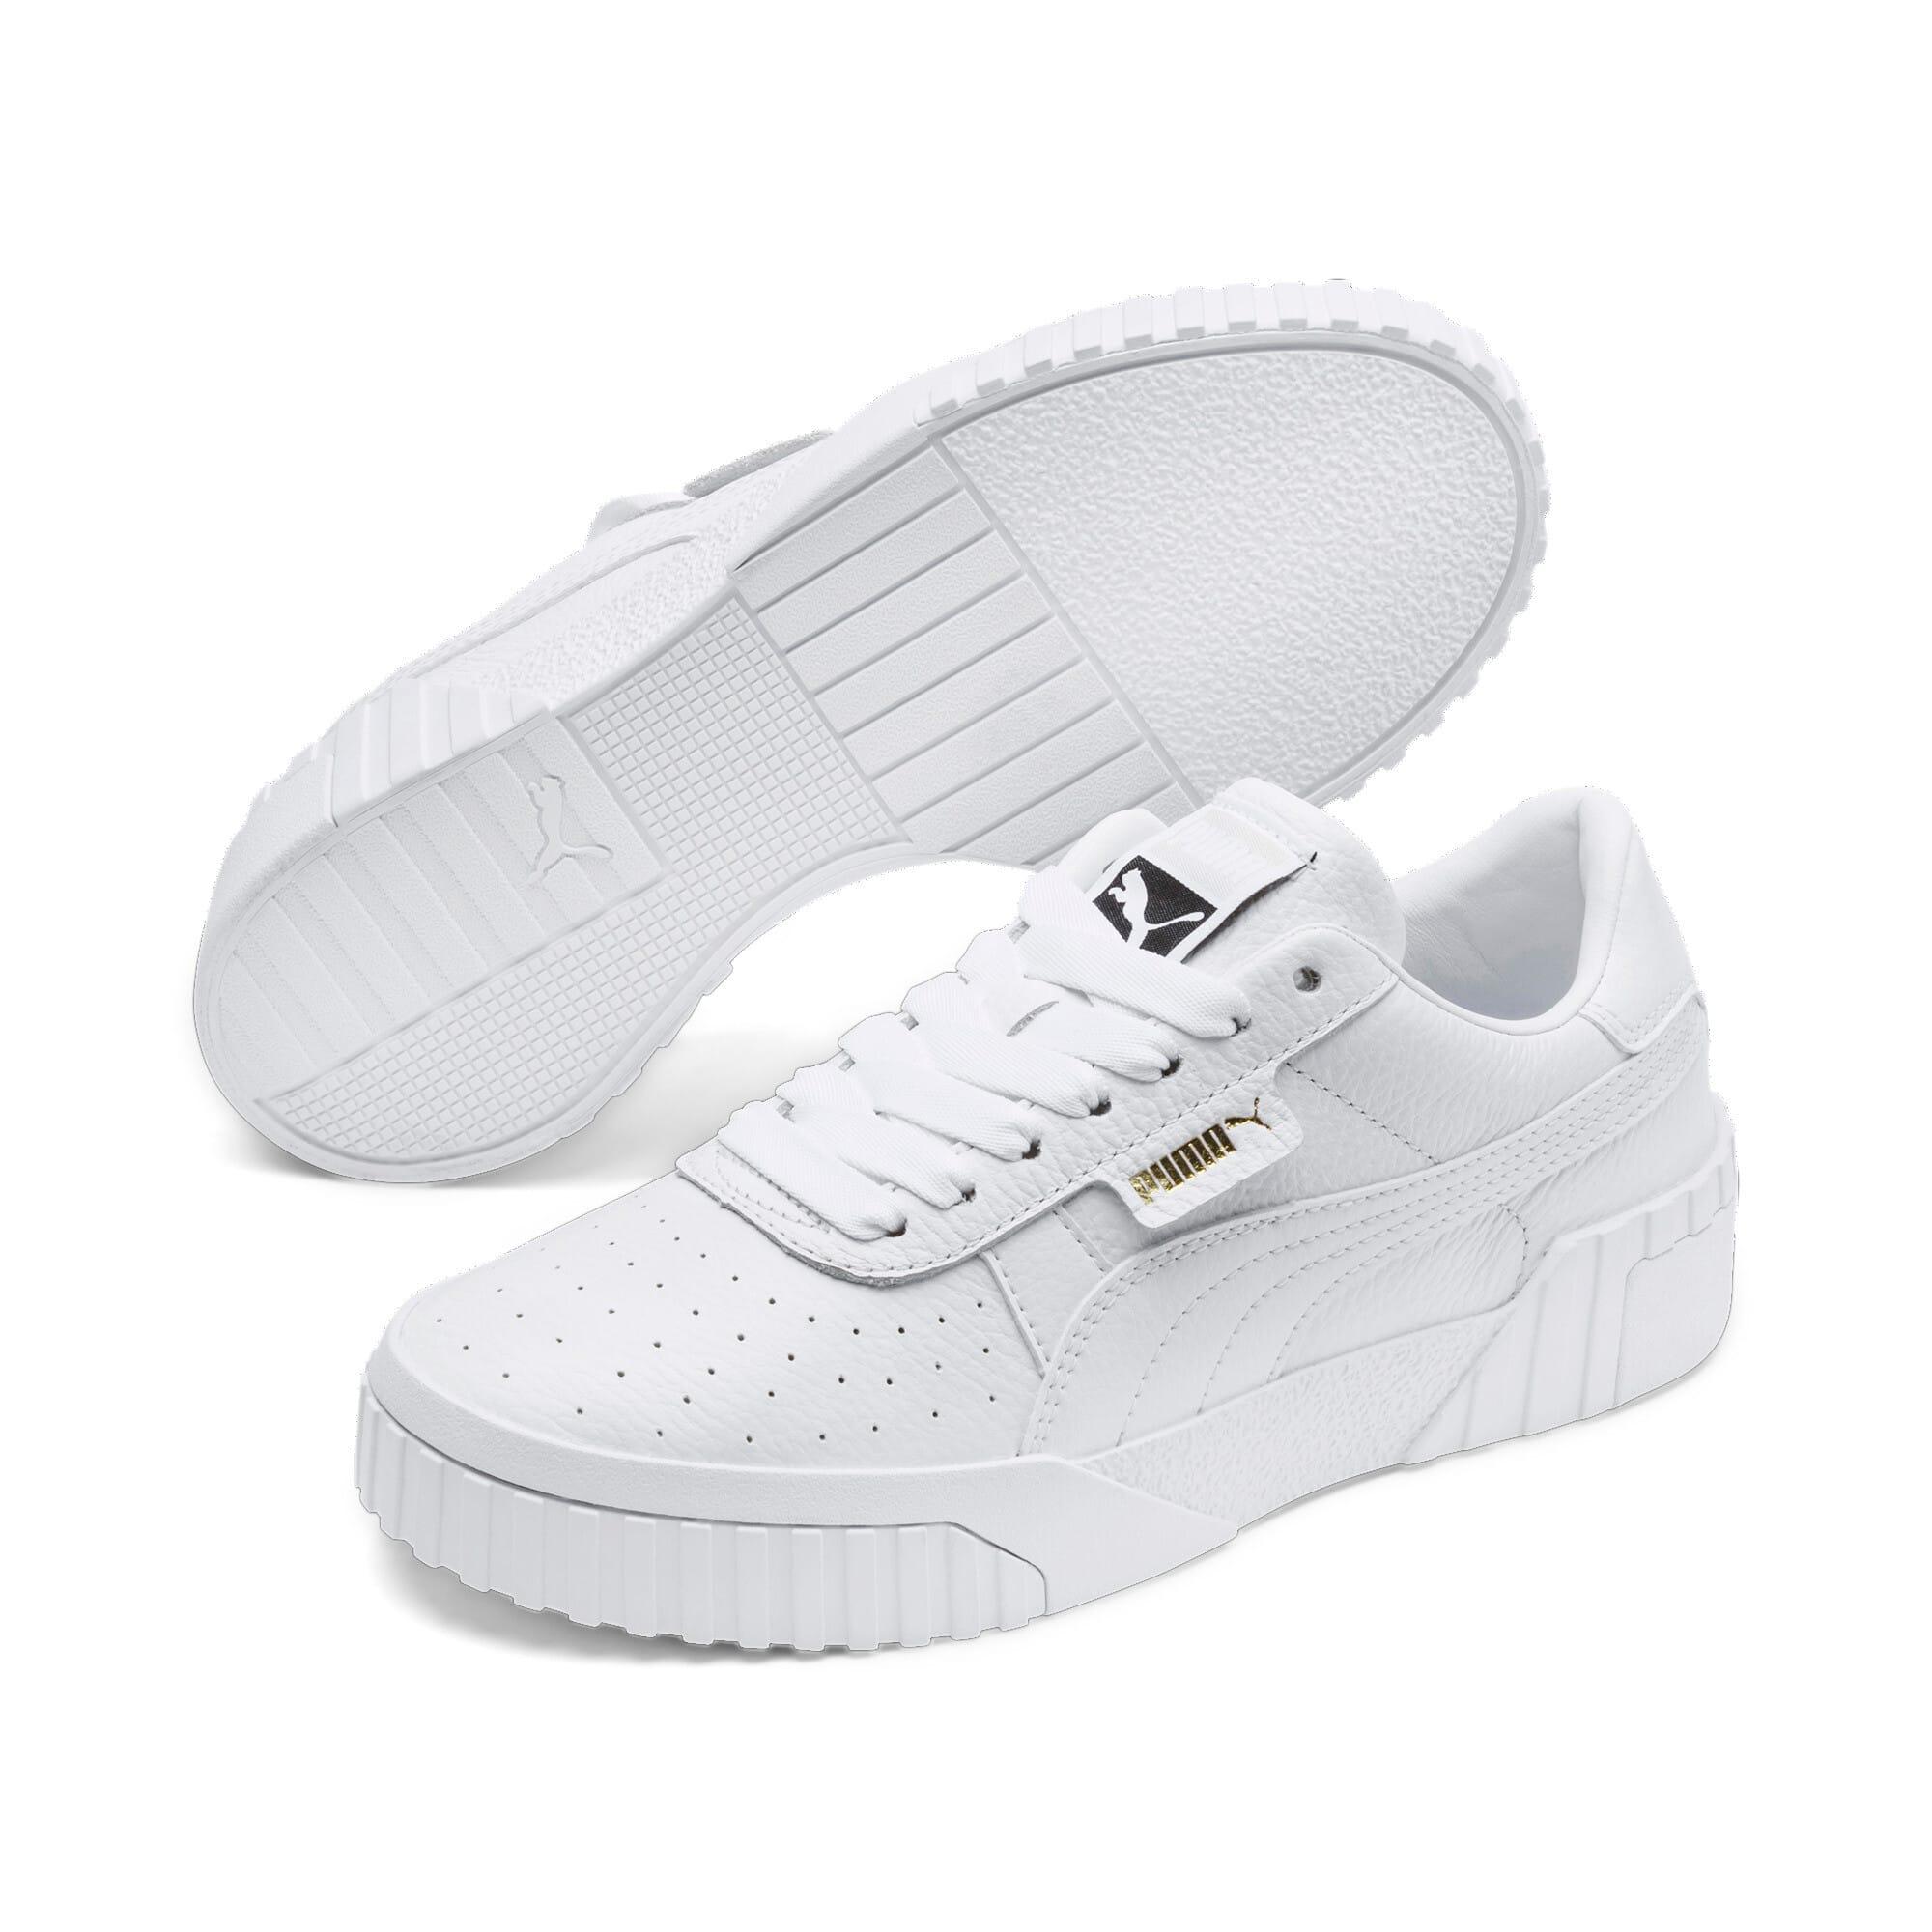 Thumbnail 3 of Cali Women's Sneakers, Puma White-Puma White, medium